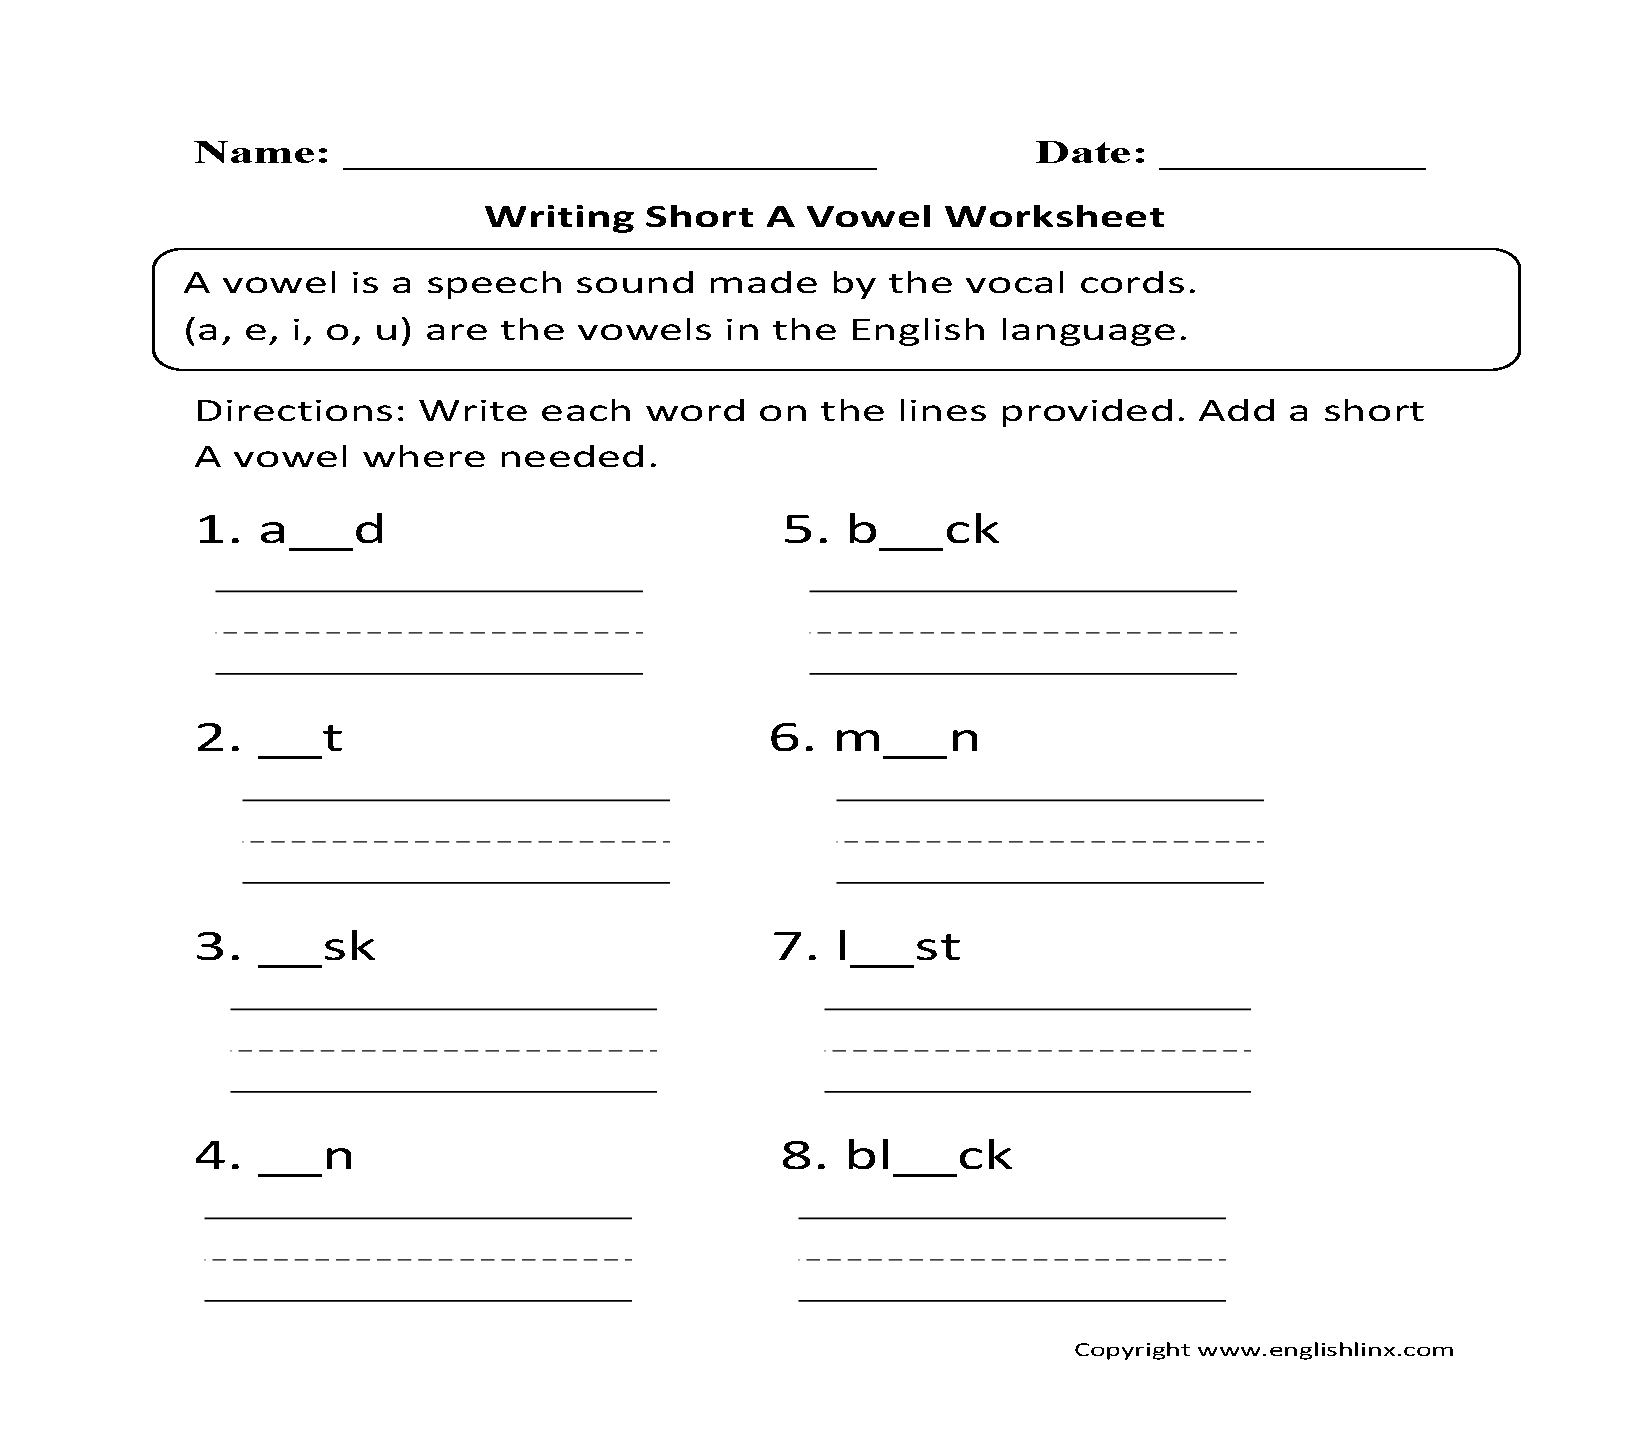 Worksheets Long And Short Vowel Worksheets worksheet short vowel o wosenly free worksheets and long writing a worksheets